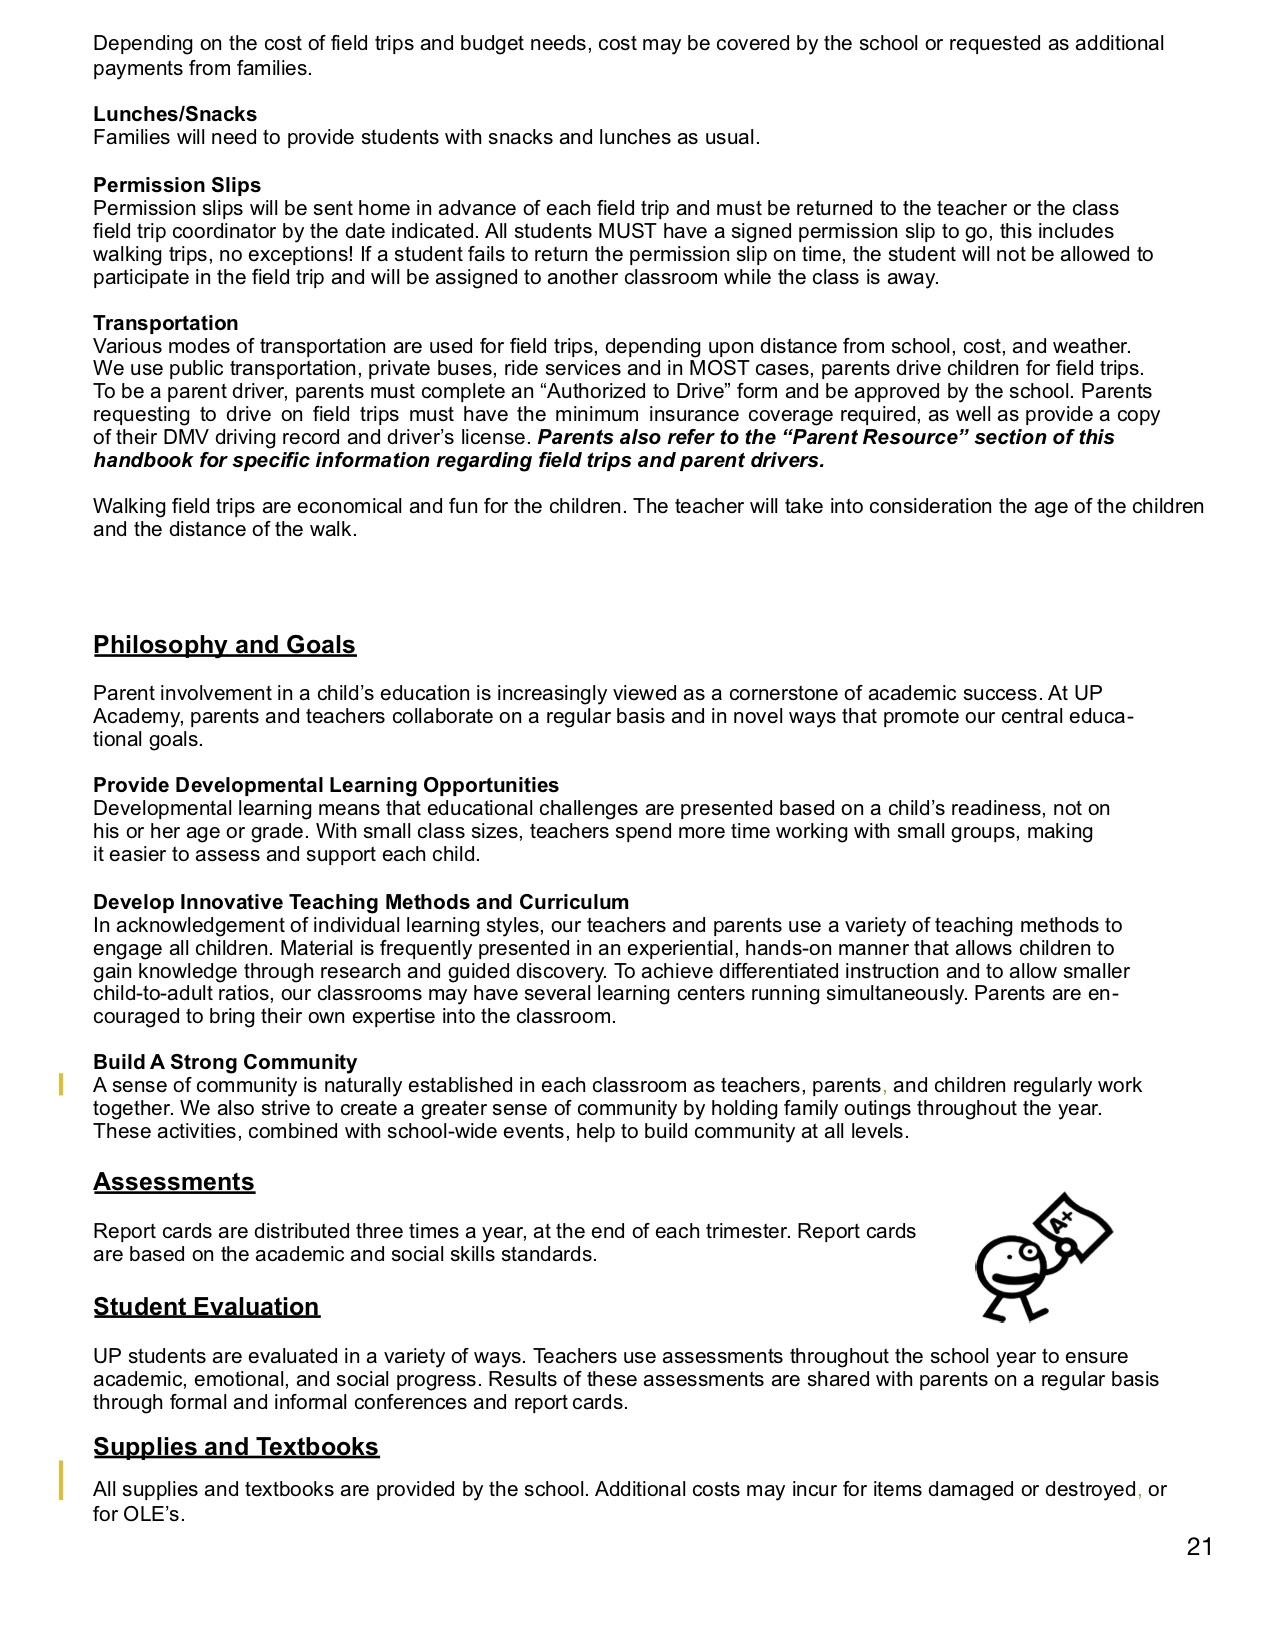 18-19 Parent and Student Handbook V4-22.jpg